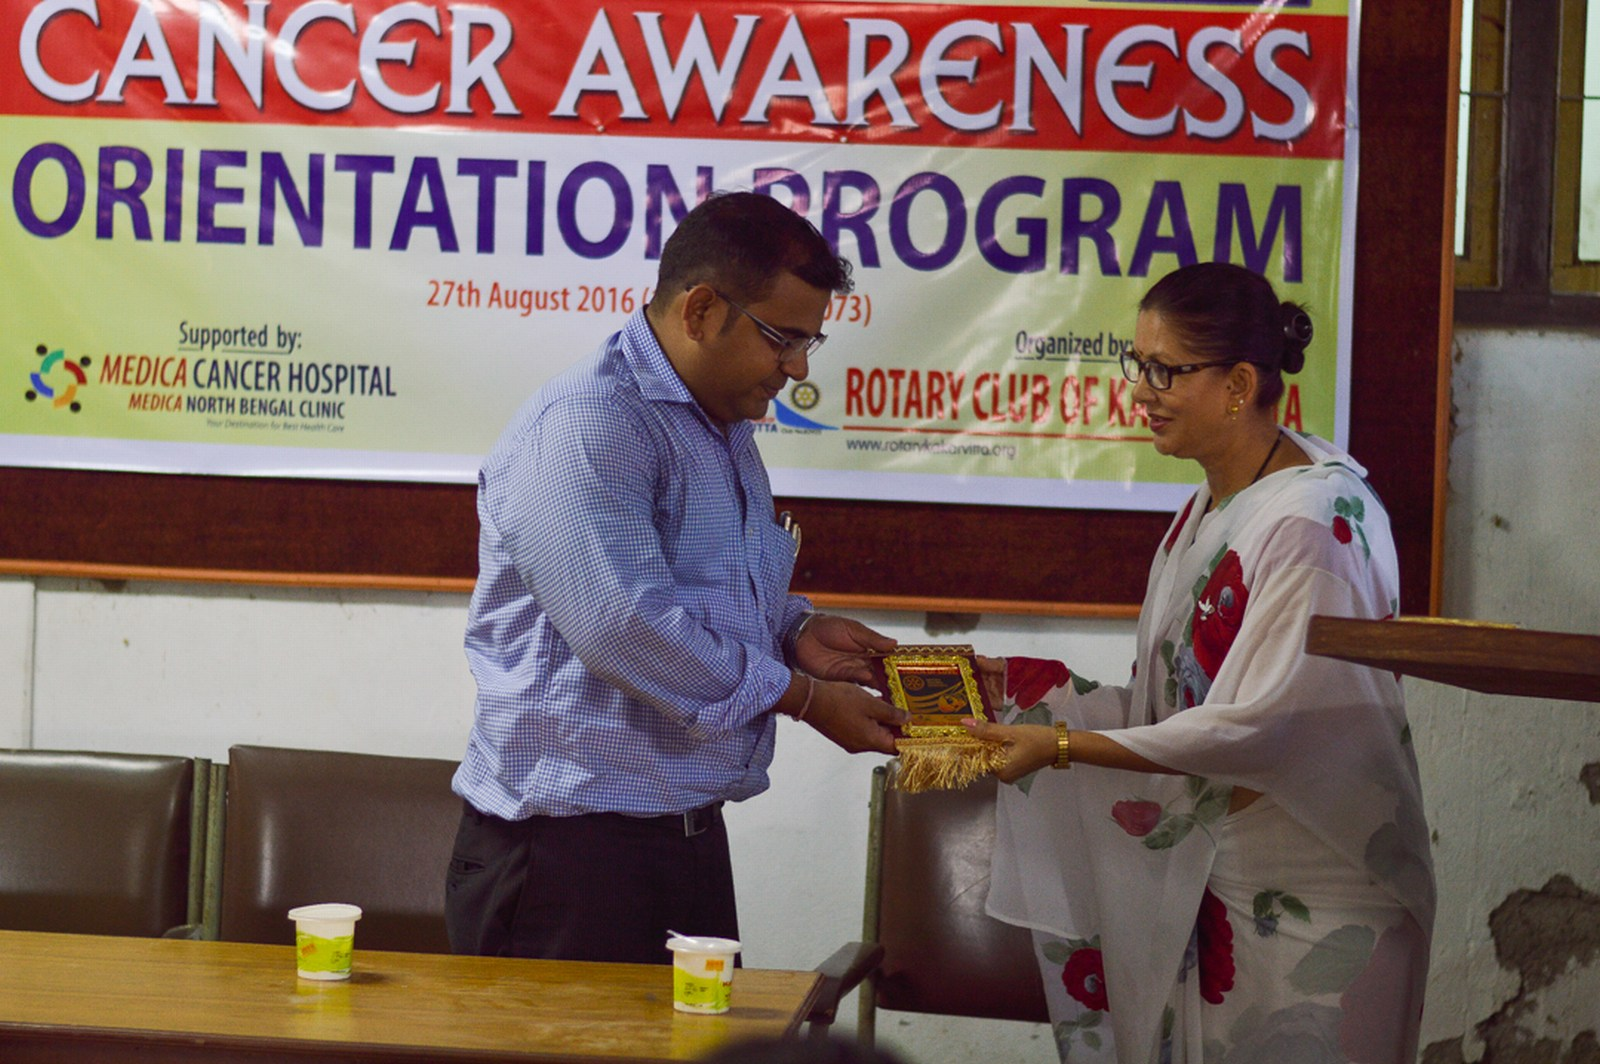 Cancer-Awareness-Orientation-Program-2016-Rotary-Club-of-Kakarvitta-31